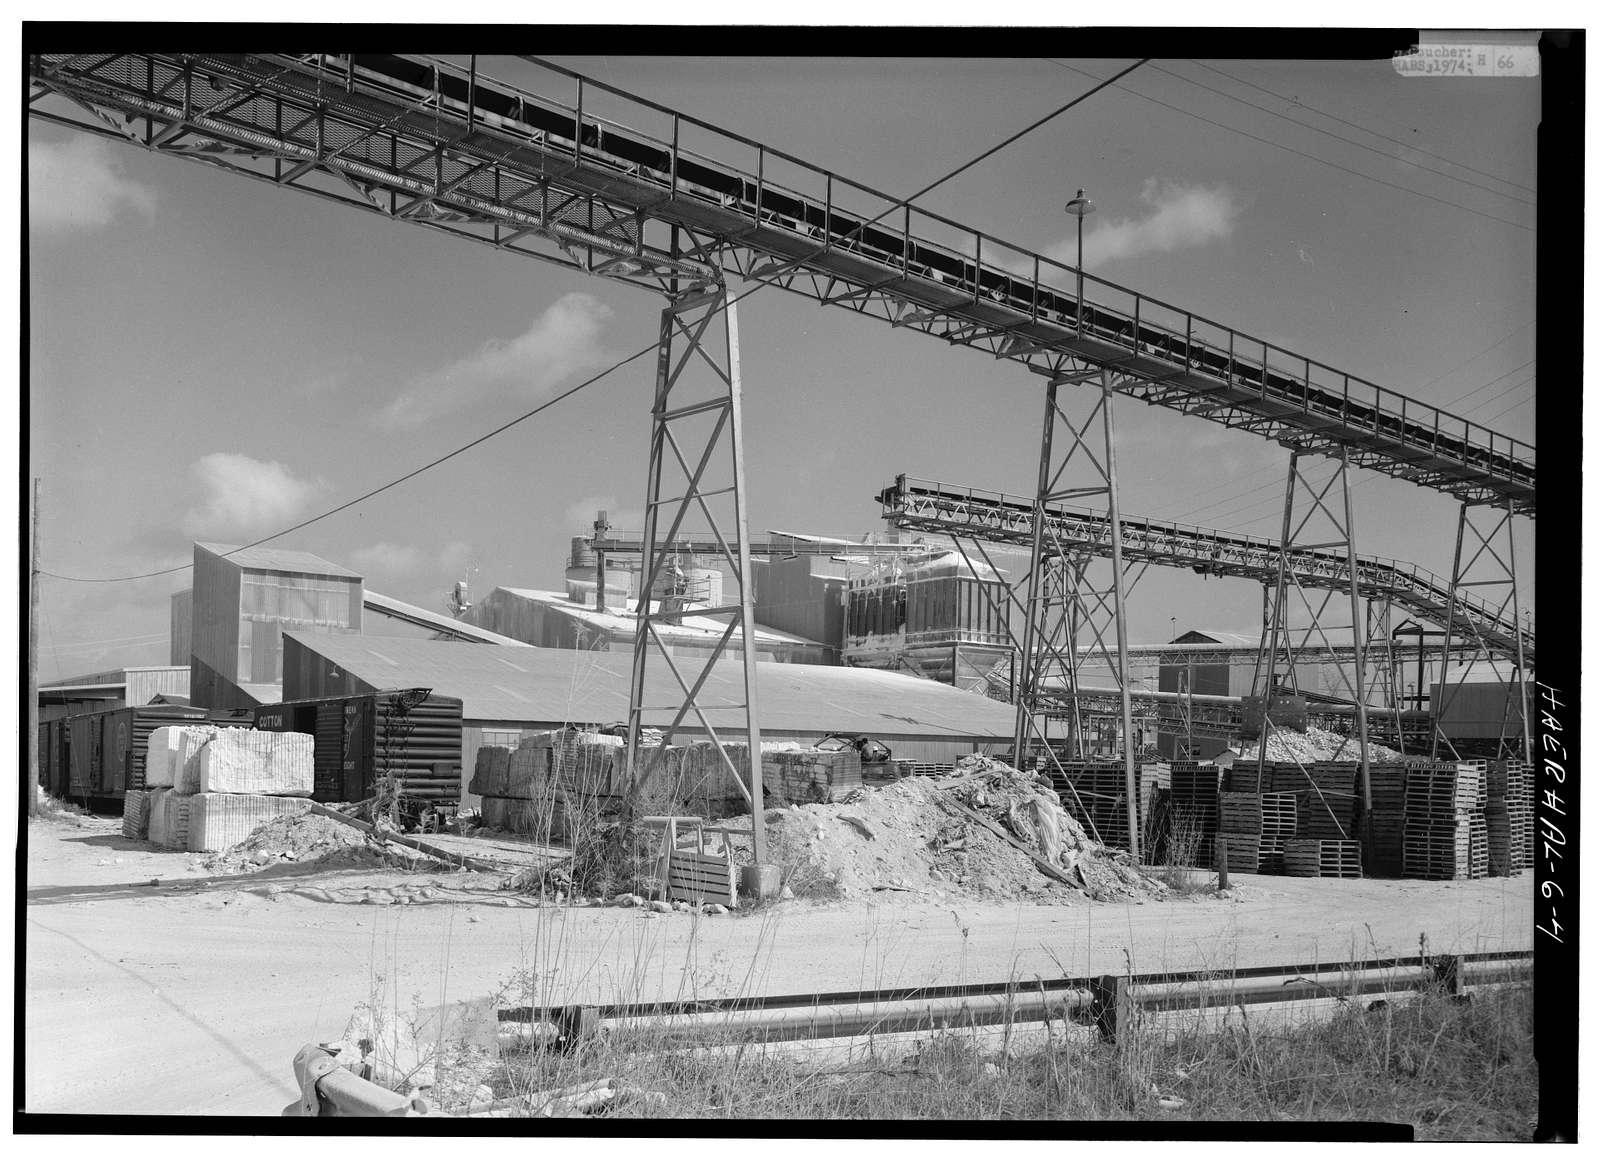 Gannts' Quarry, Quarry Road, Sylacauga, Talladega County, AL